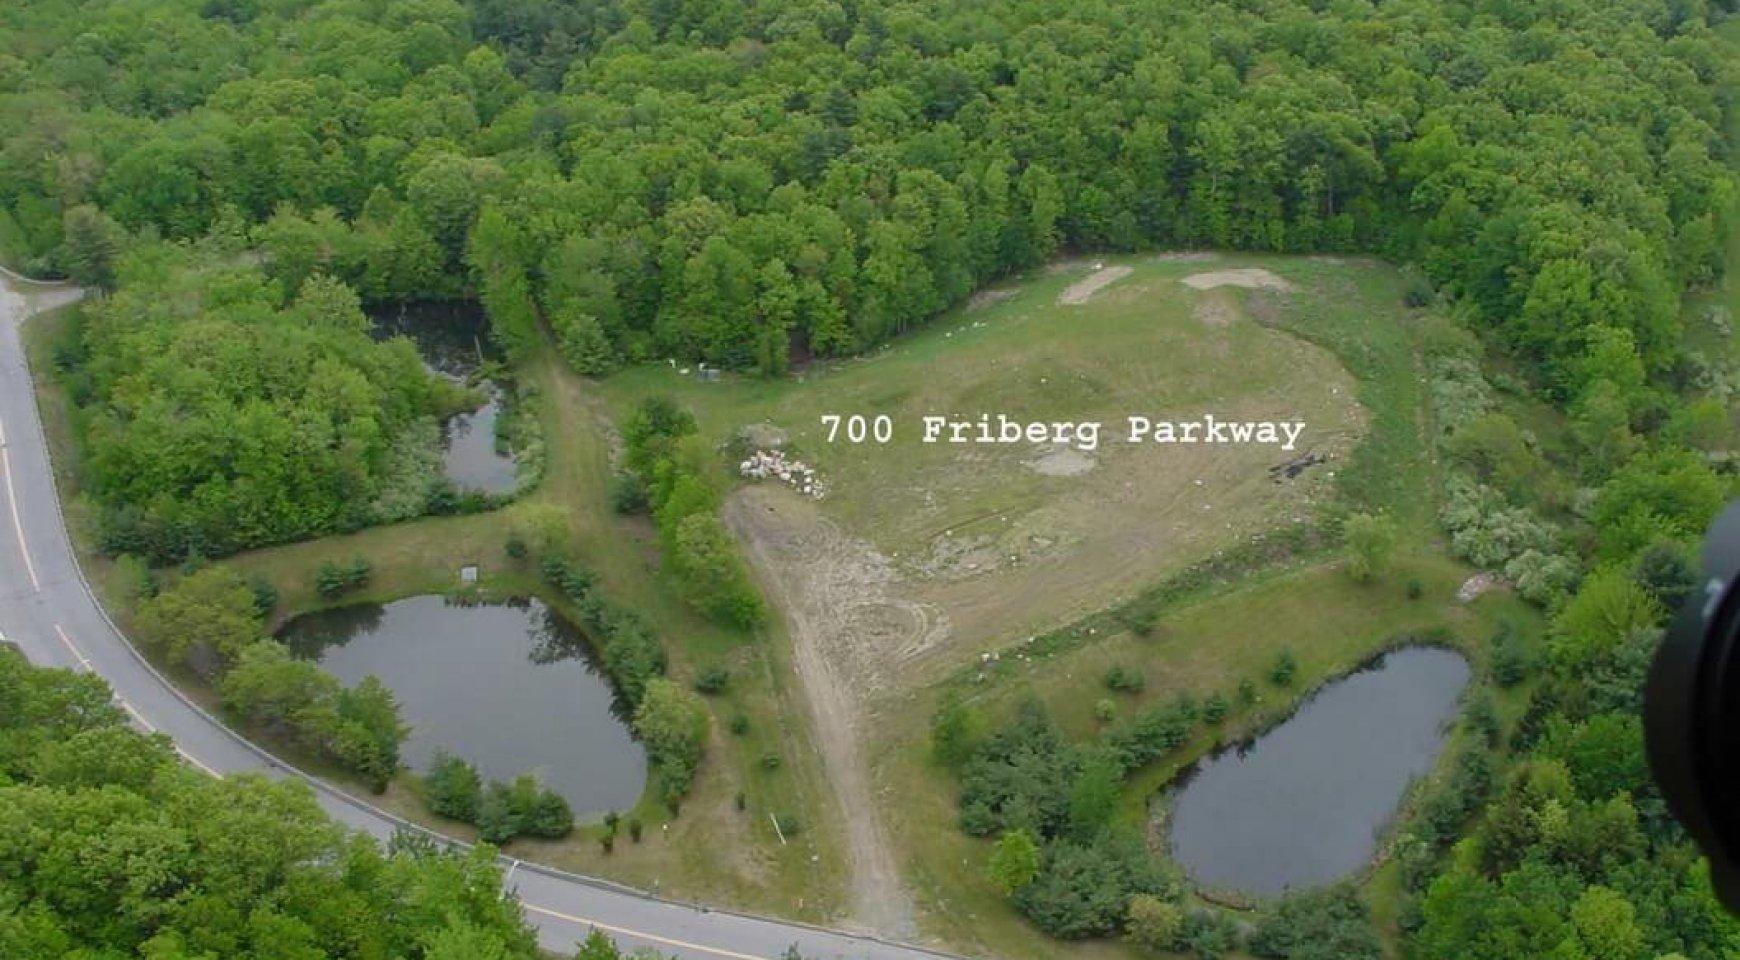 700 Friberg Parkway